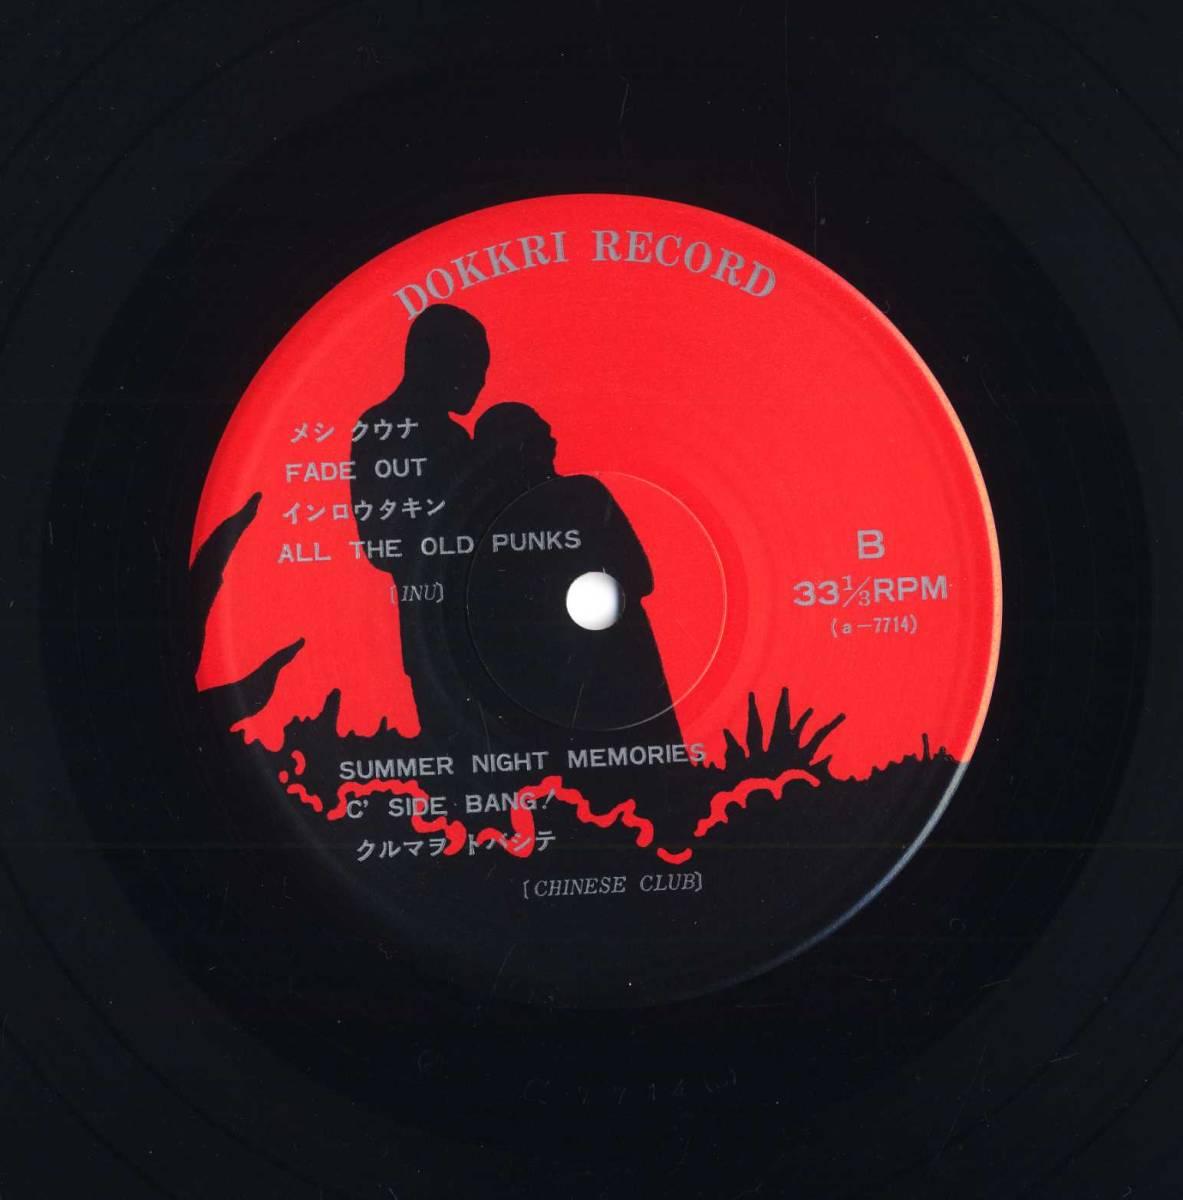 LP★INU他/DOKKIRI RECORDドッキリレコード:自主盤赤JK/町田町蔵★ULTRA BIDE,ALCOHOL42%,変身キリン,CHINESE CLUB/a-7713/限定200枚/PUNK_画像5